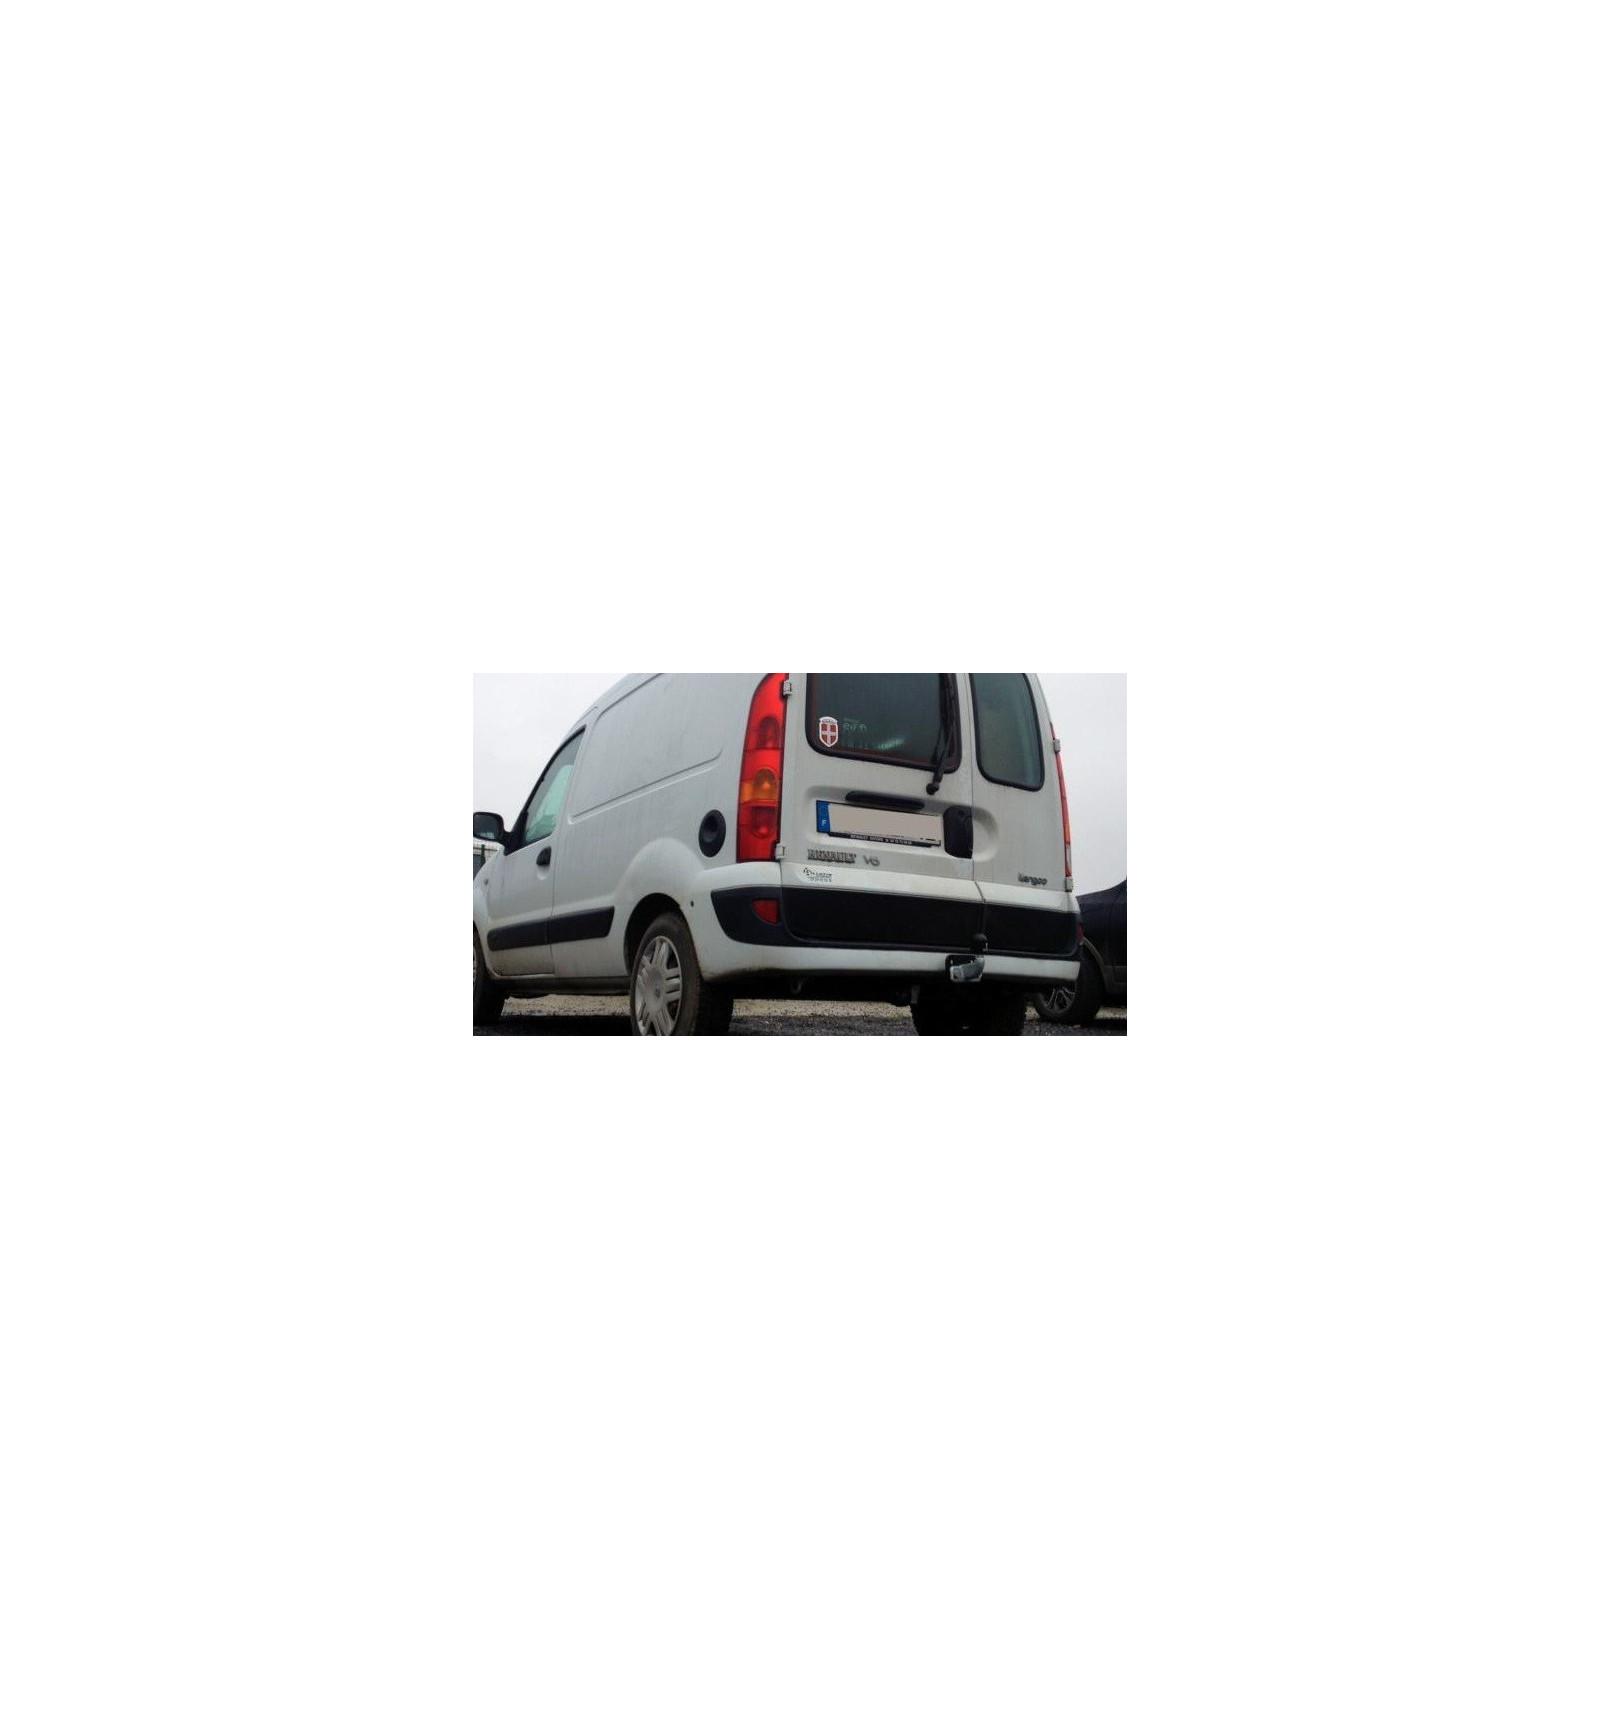 best authentic vast selection amazing selection Attelage Remorque Renault Kangoo 1 - Origine Pieces Auto